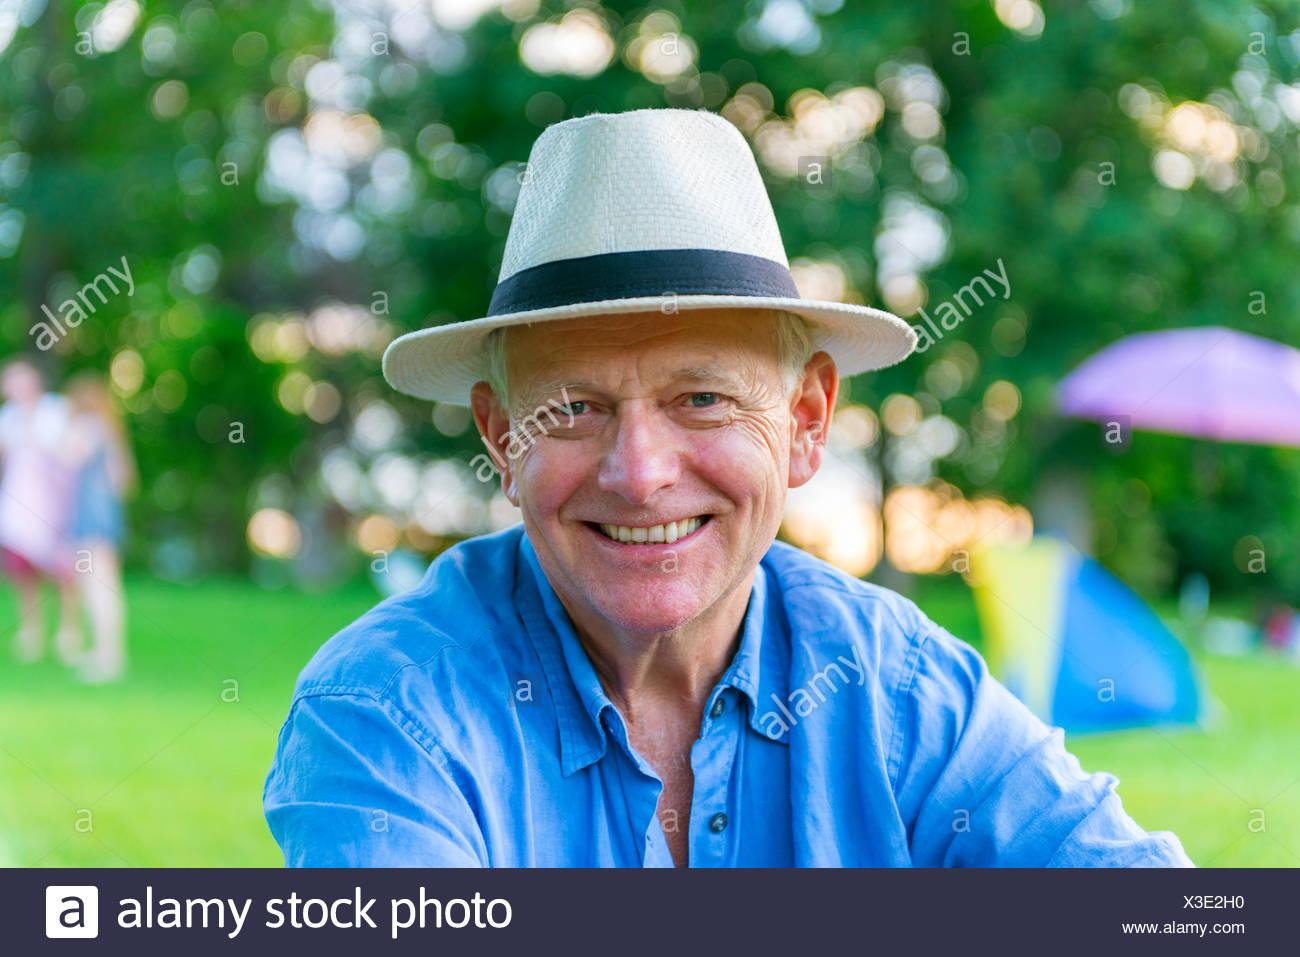 Elderly man with hat smiling, Bavaria, Germany - Stock Image